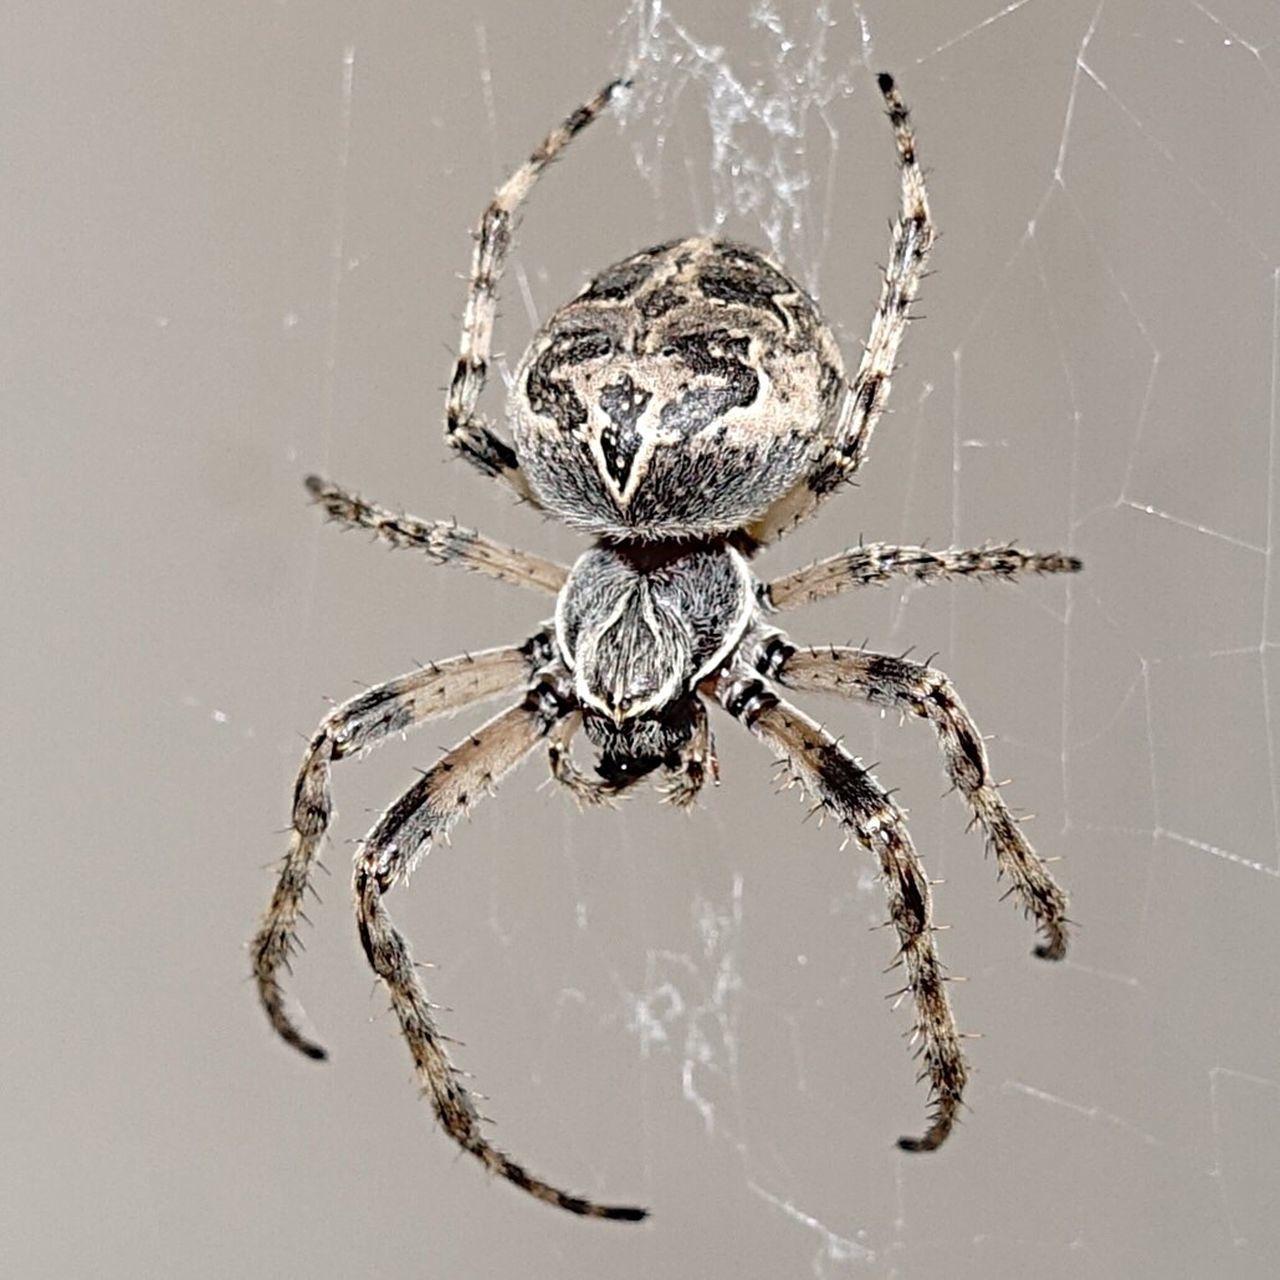 Kreuzspinne Huntress Spiderman Arachne SONYrx100m3 Sony Rx100 Iii Sony Rx100 M3 Animalsofinstagram Sonyrx100iii Bdsmlifestyle Animal Photography Makro Makro Photography Makro Spinne Dangerouslysexy